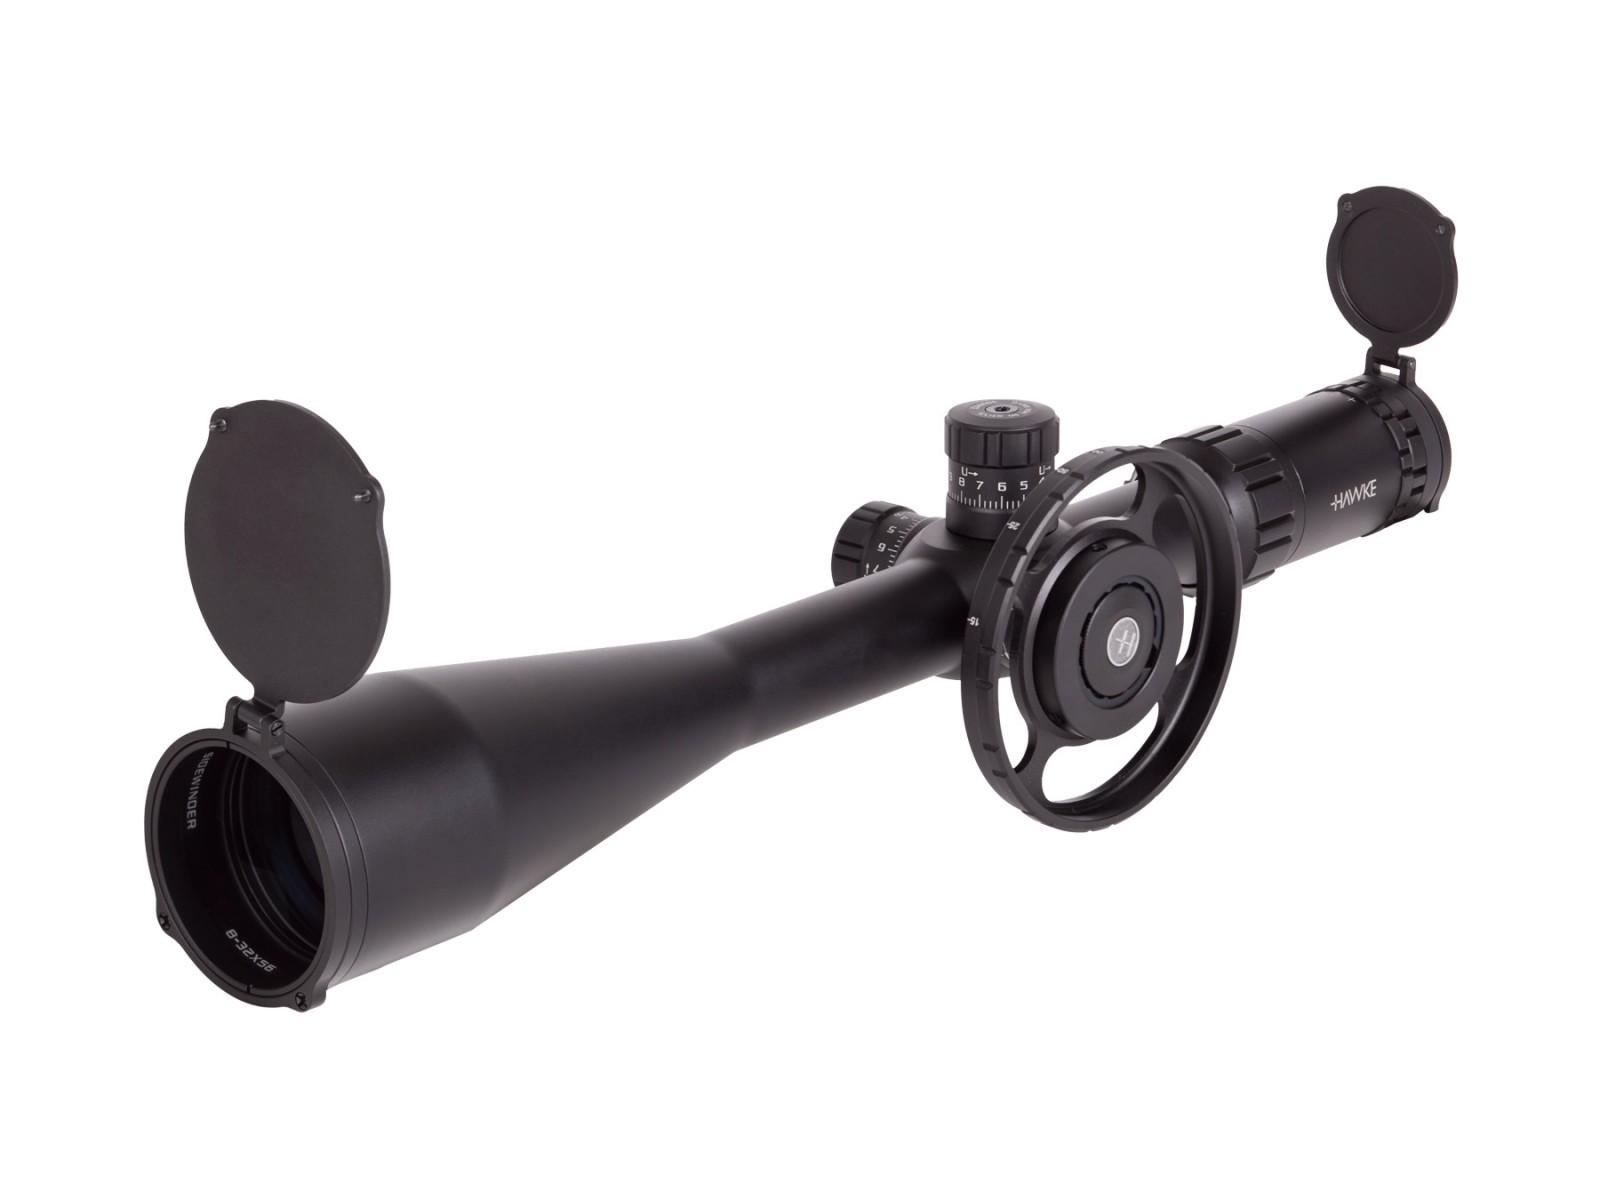 Hawke Sport Optics Sidewinder 30 8-32x56 AO Rifle Scope, Ill. 20x 1/2 Mil-Dot Reticle, 1/4 MOA, 30mm Tube